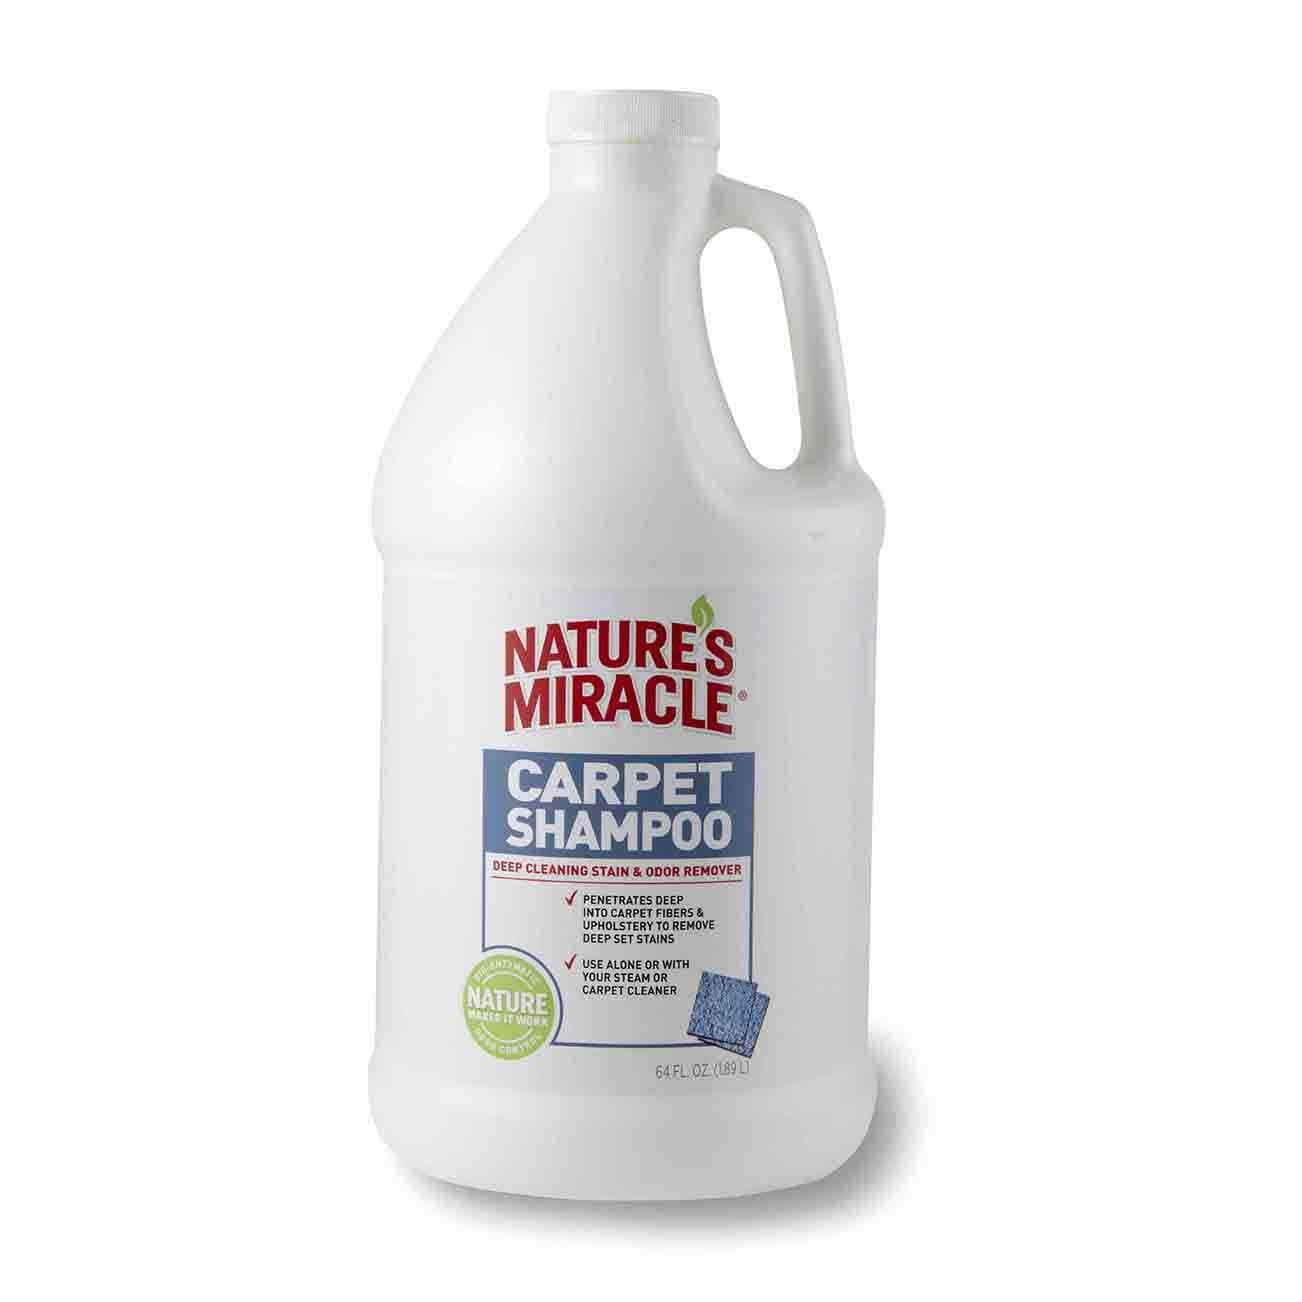 От пятен и запахов 8in1 средство моющее для ковров и мягкой мебели NM CarpetShampoo с нейтрализаторами аллергенов 018065055545.jpg